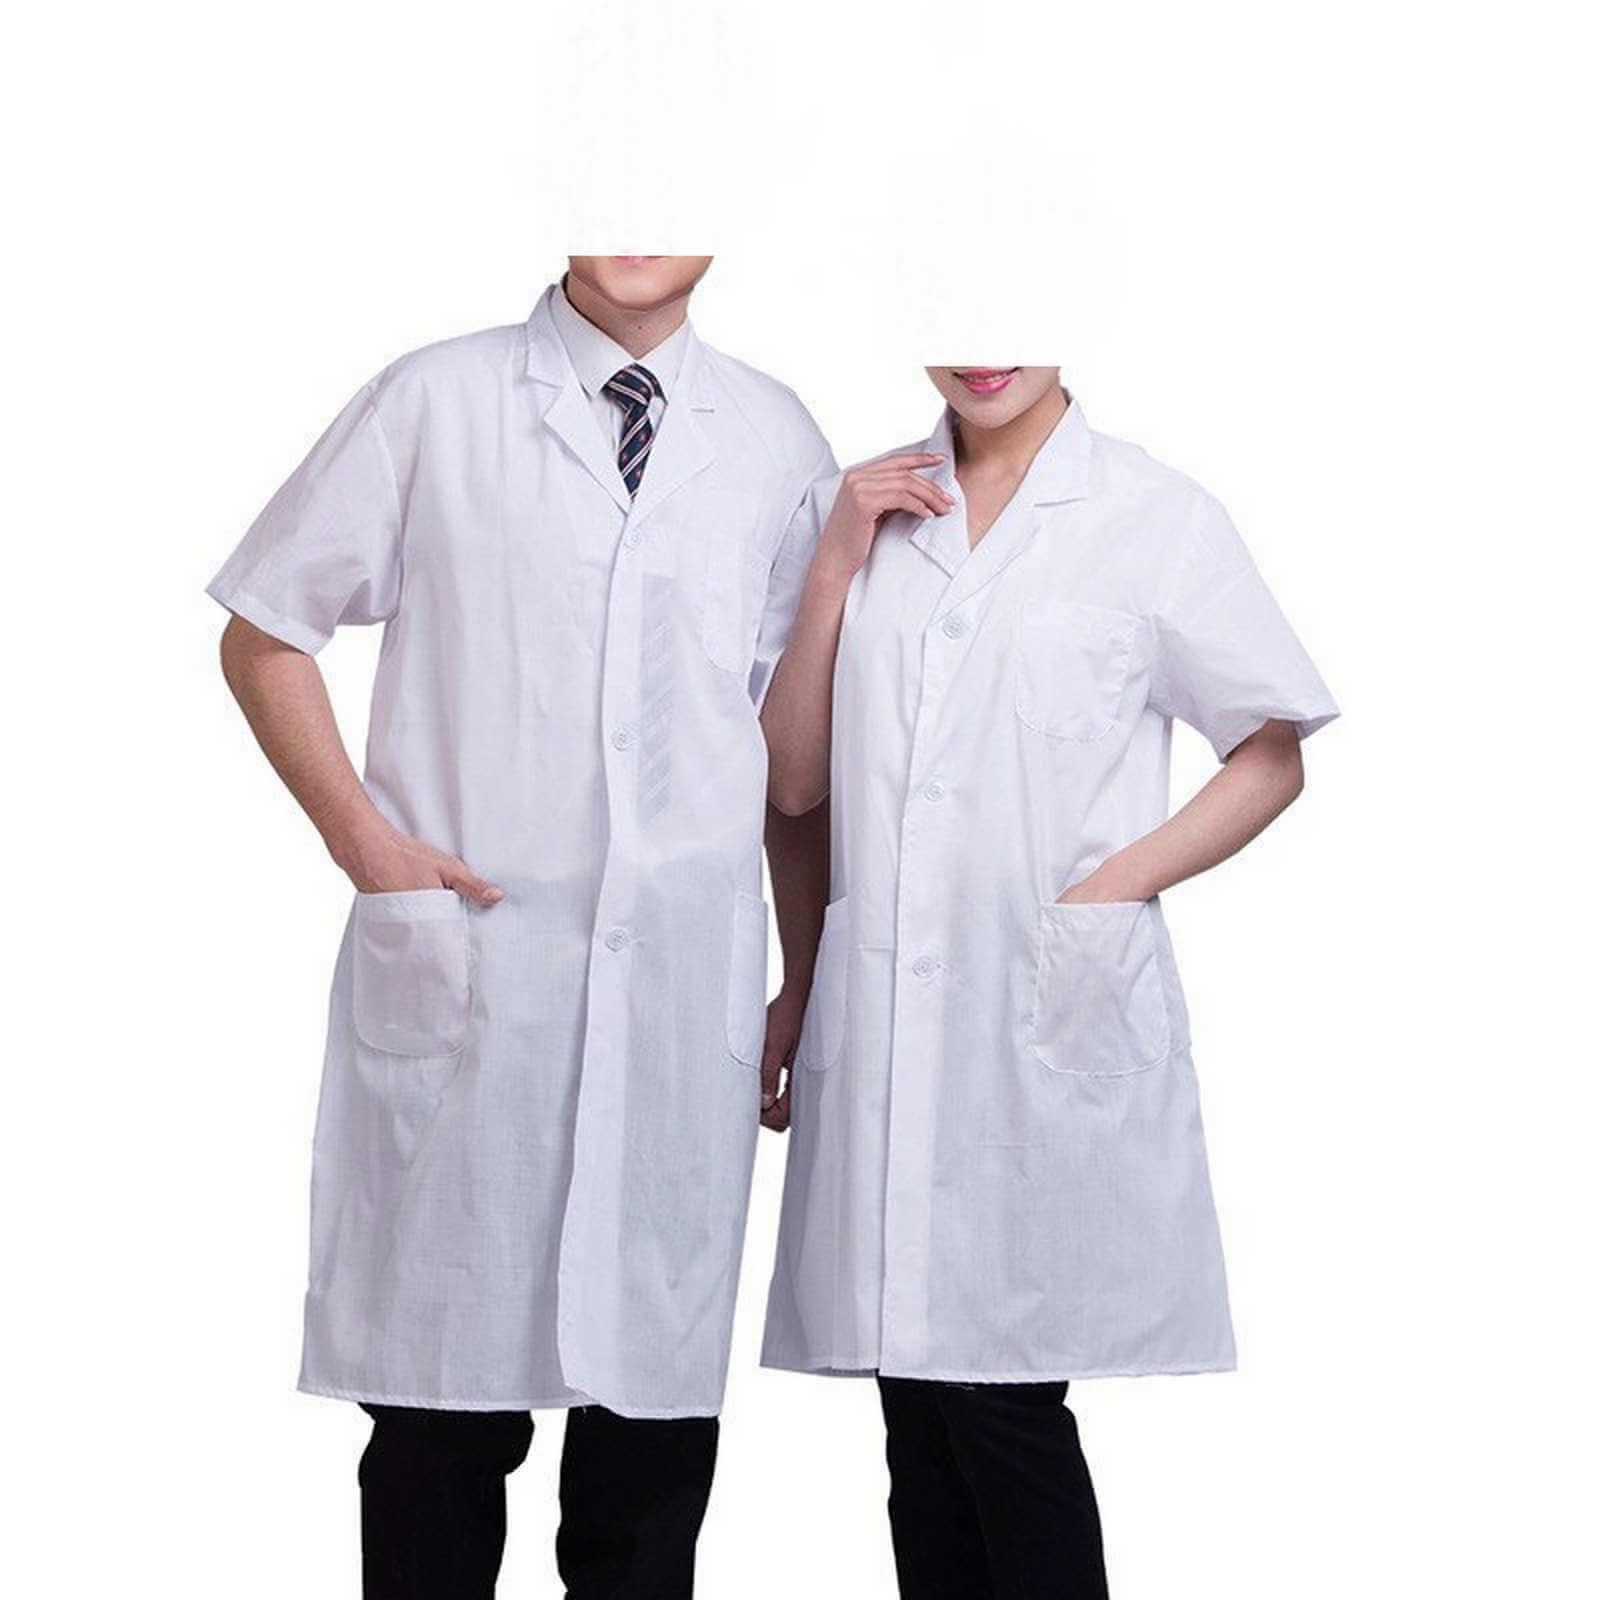 Blouse blanche médicale manche courte polyester